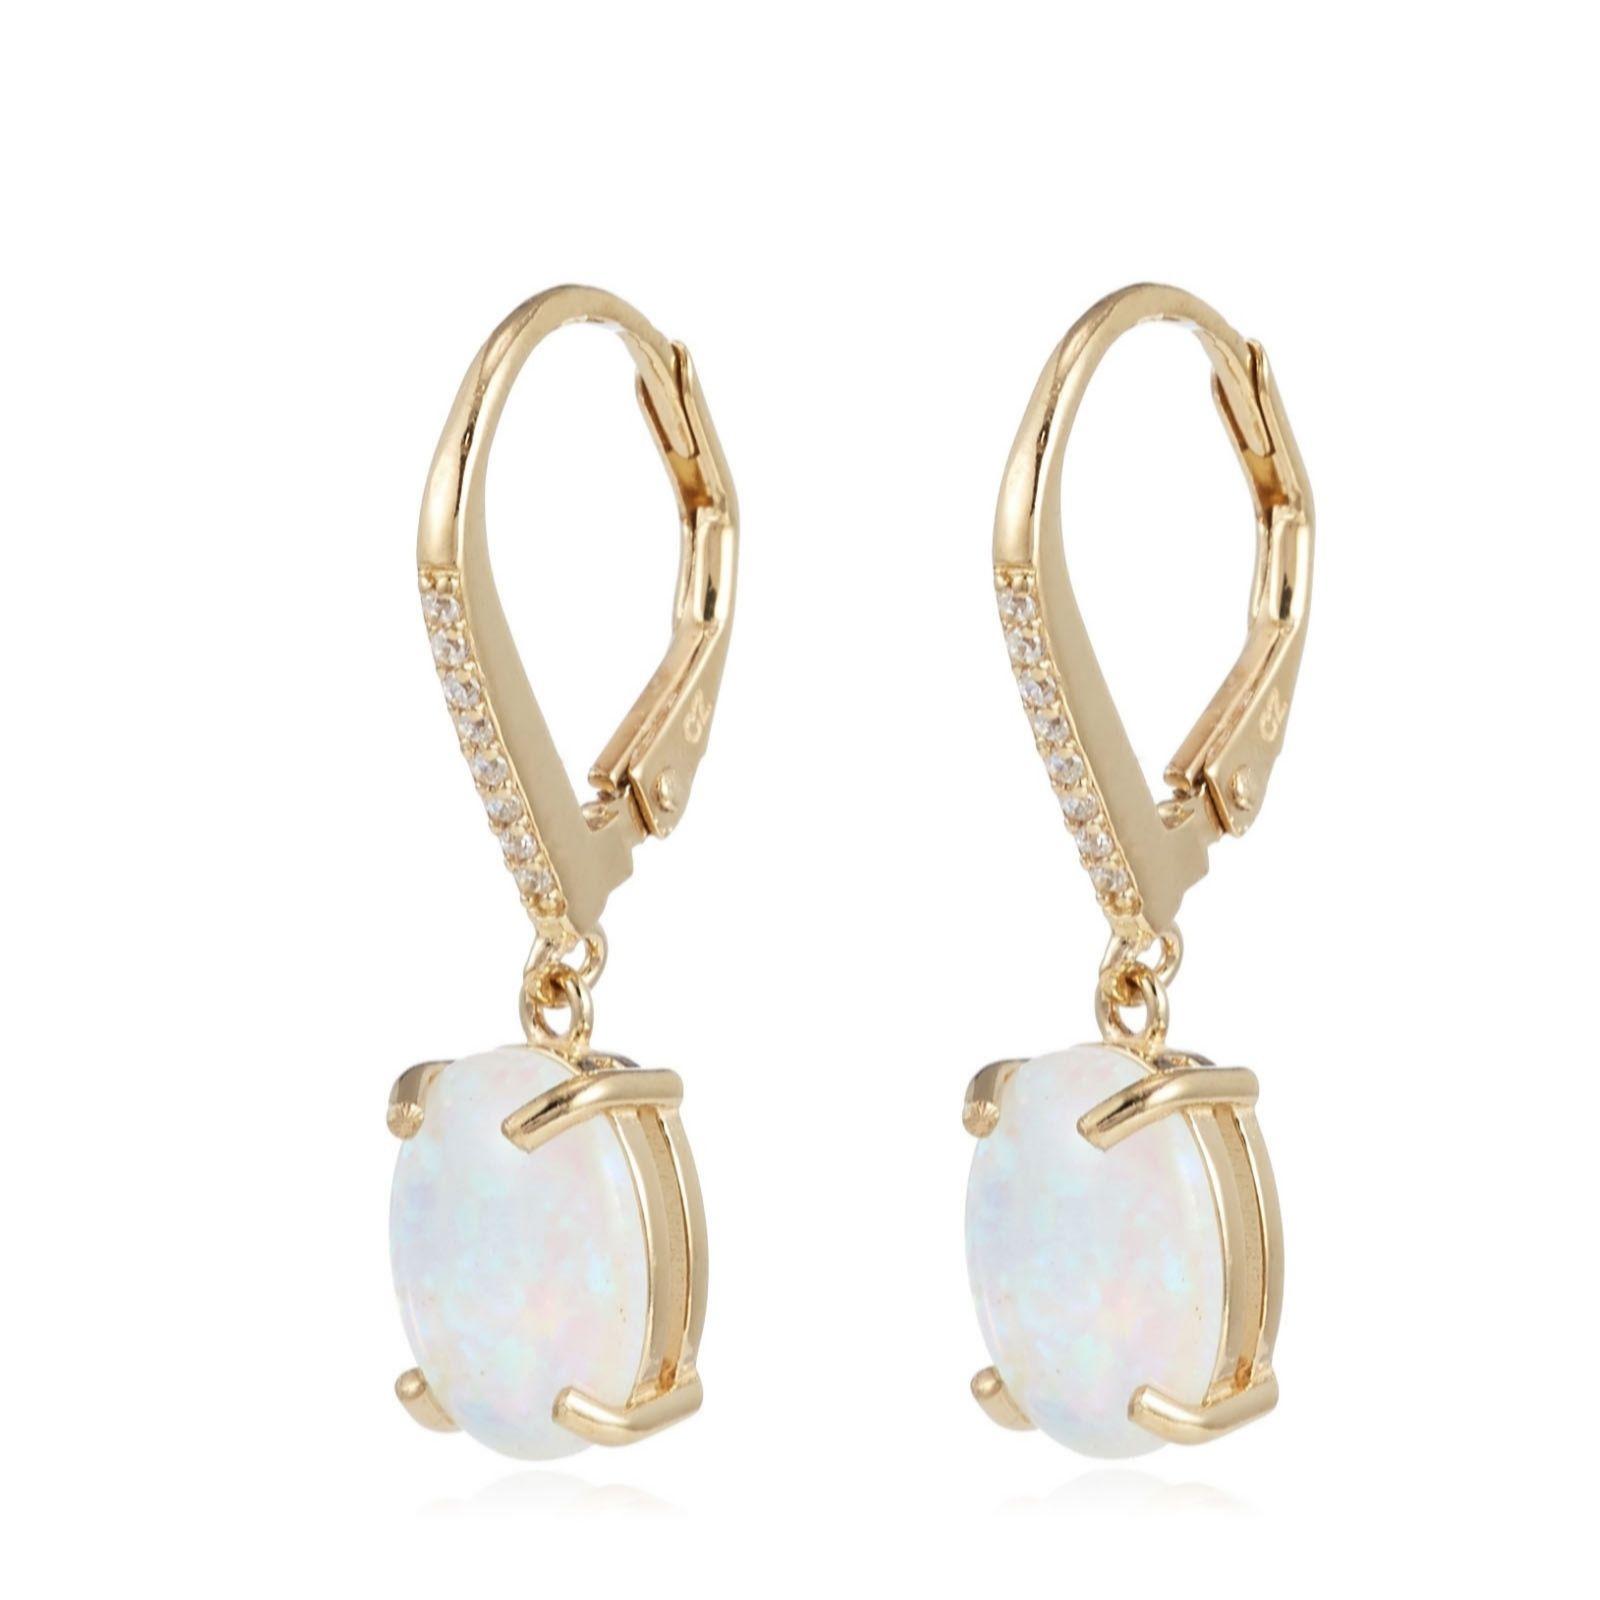 3f3c3deea Diamonique 1.5ct tw Simulated Opal Earrings Sterling Silver - QVC UK